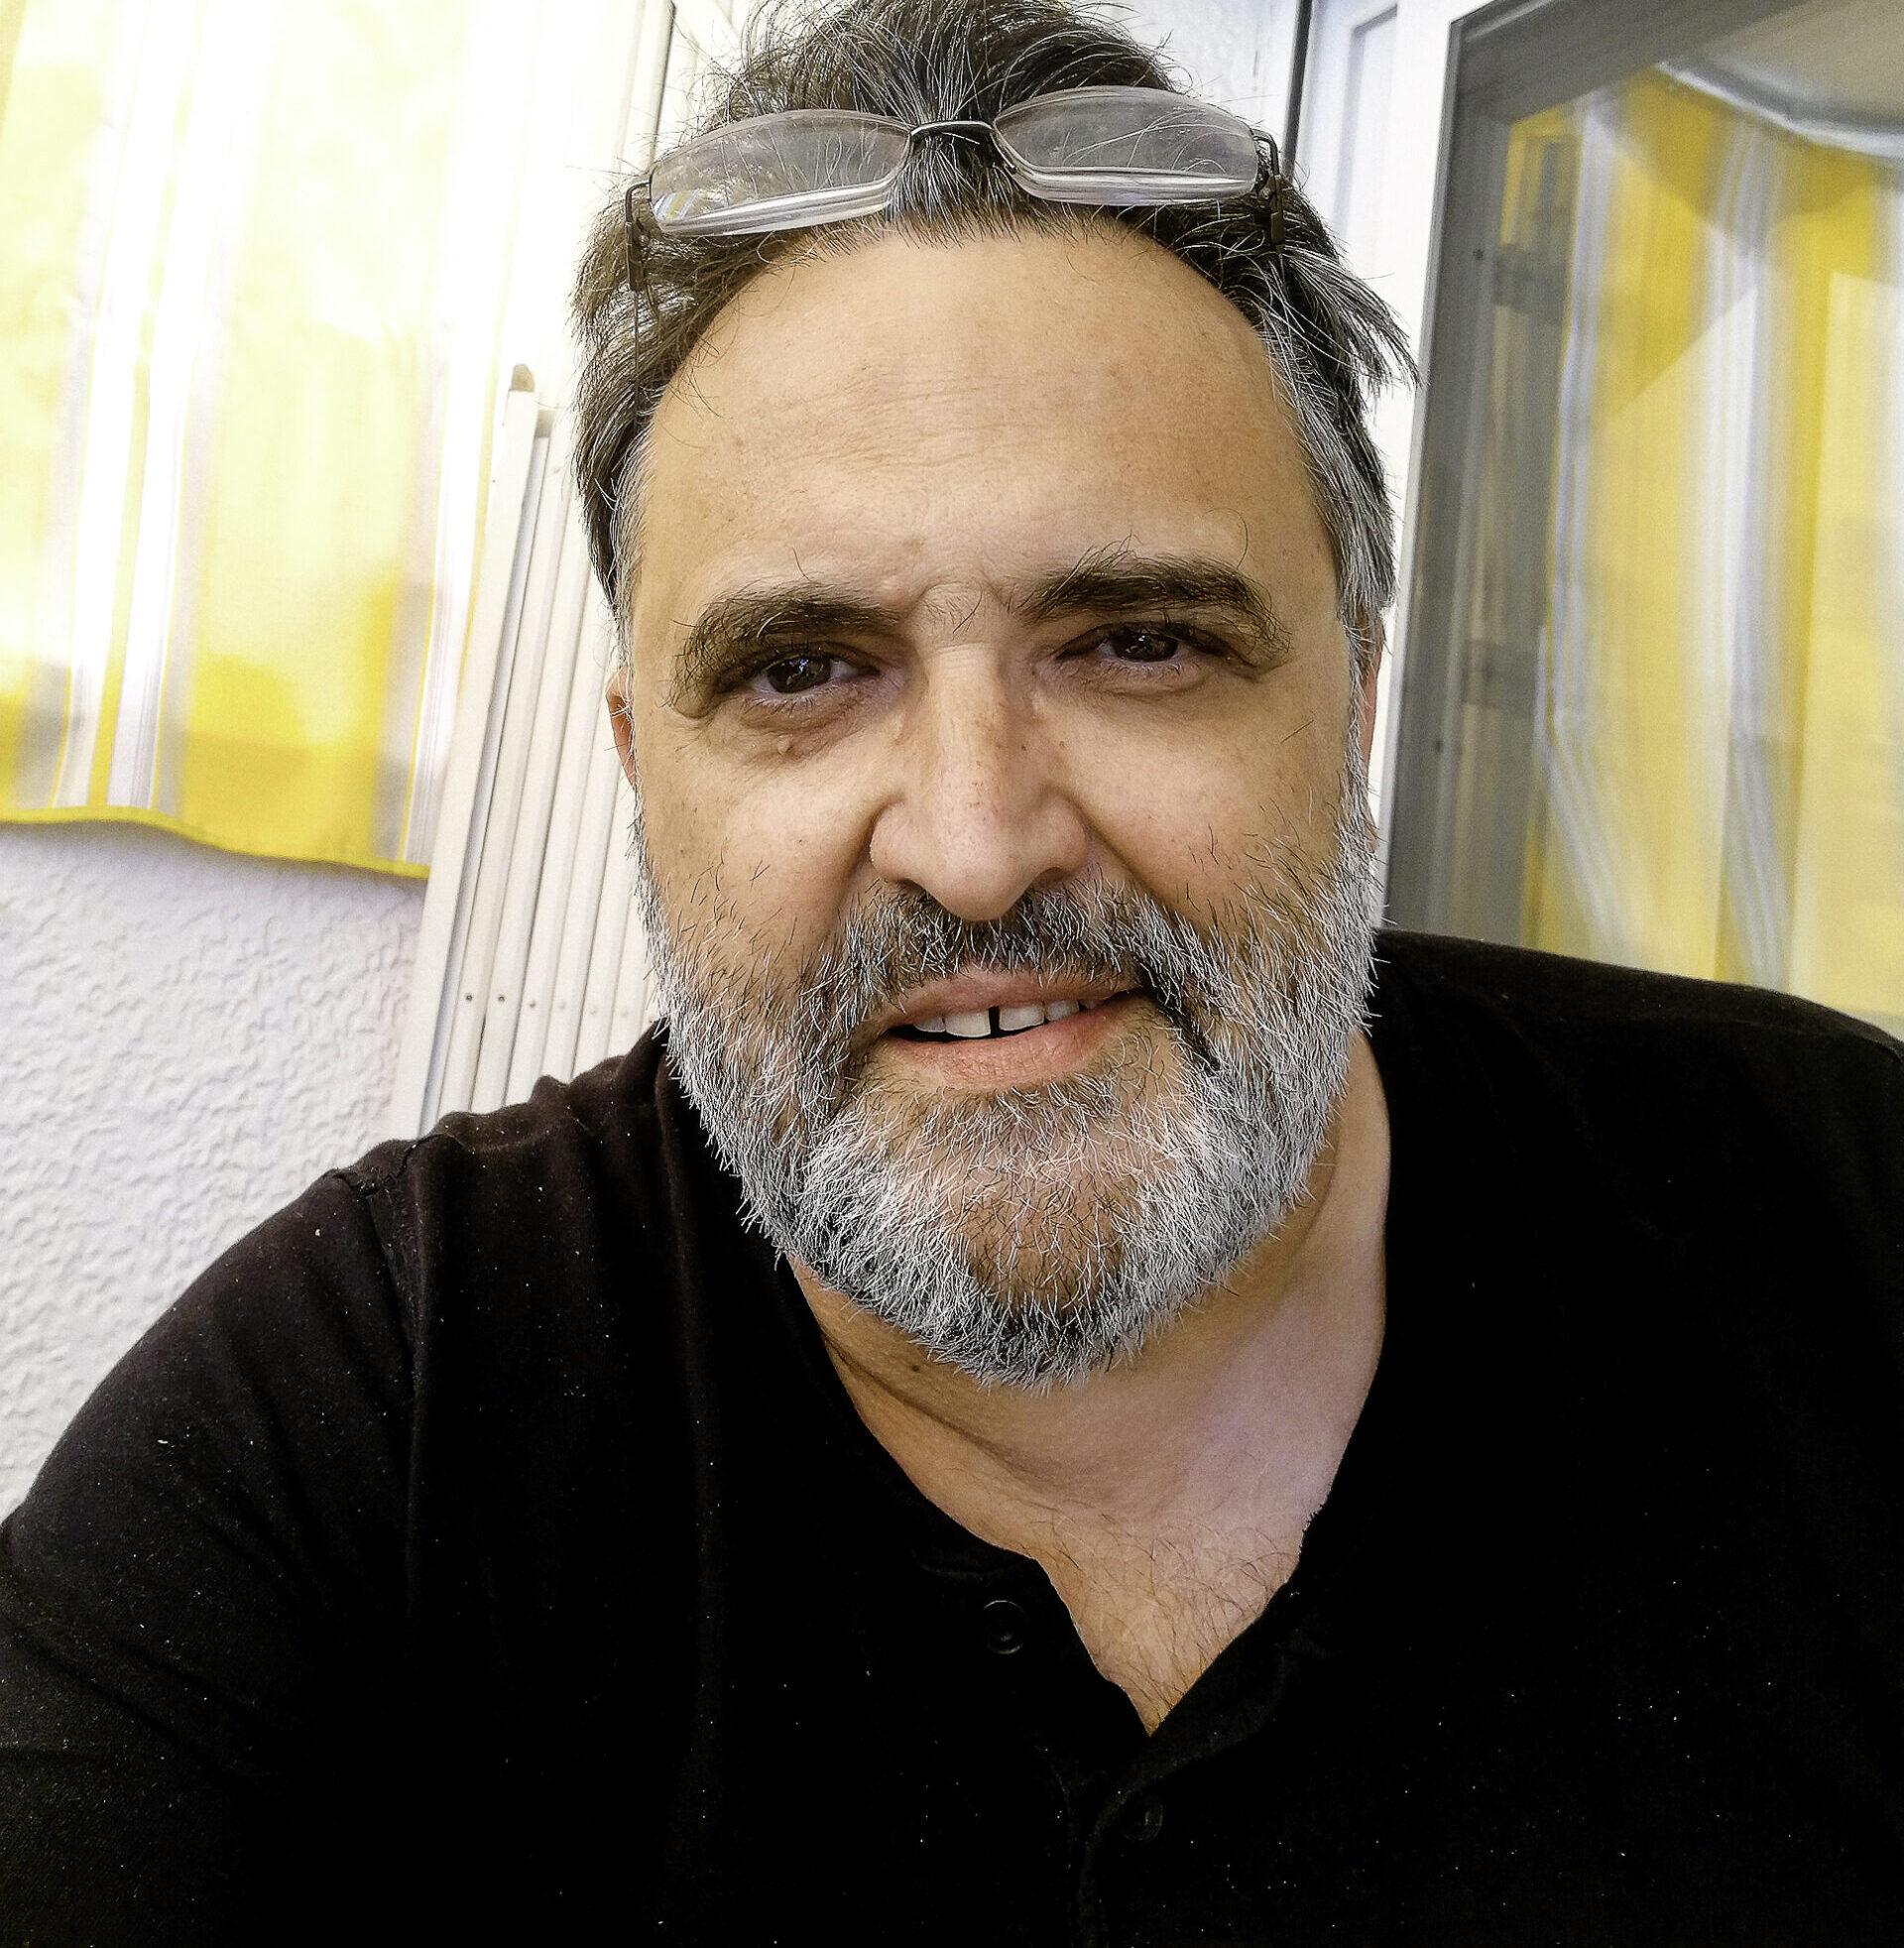 Maximiliano Garcia